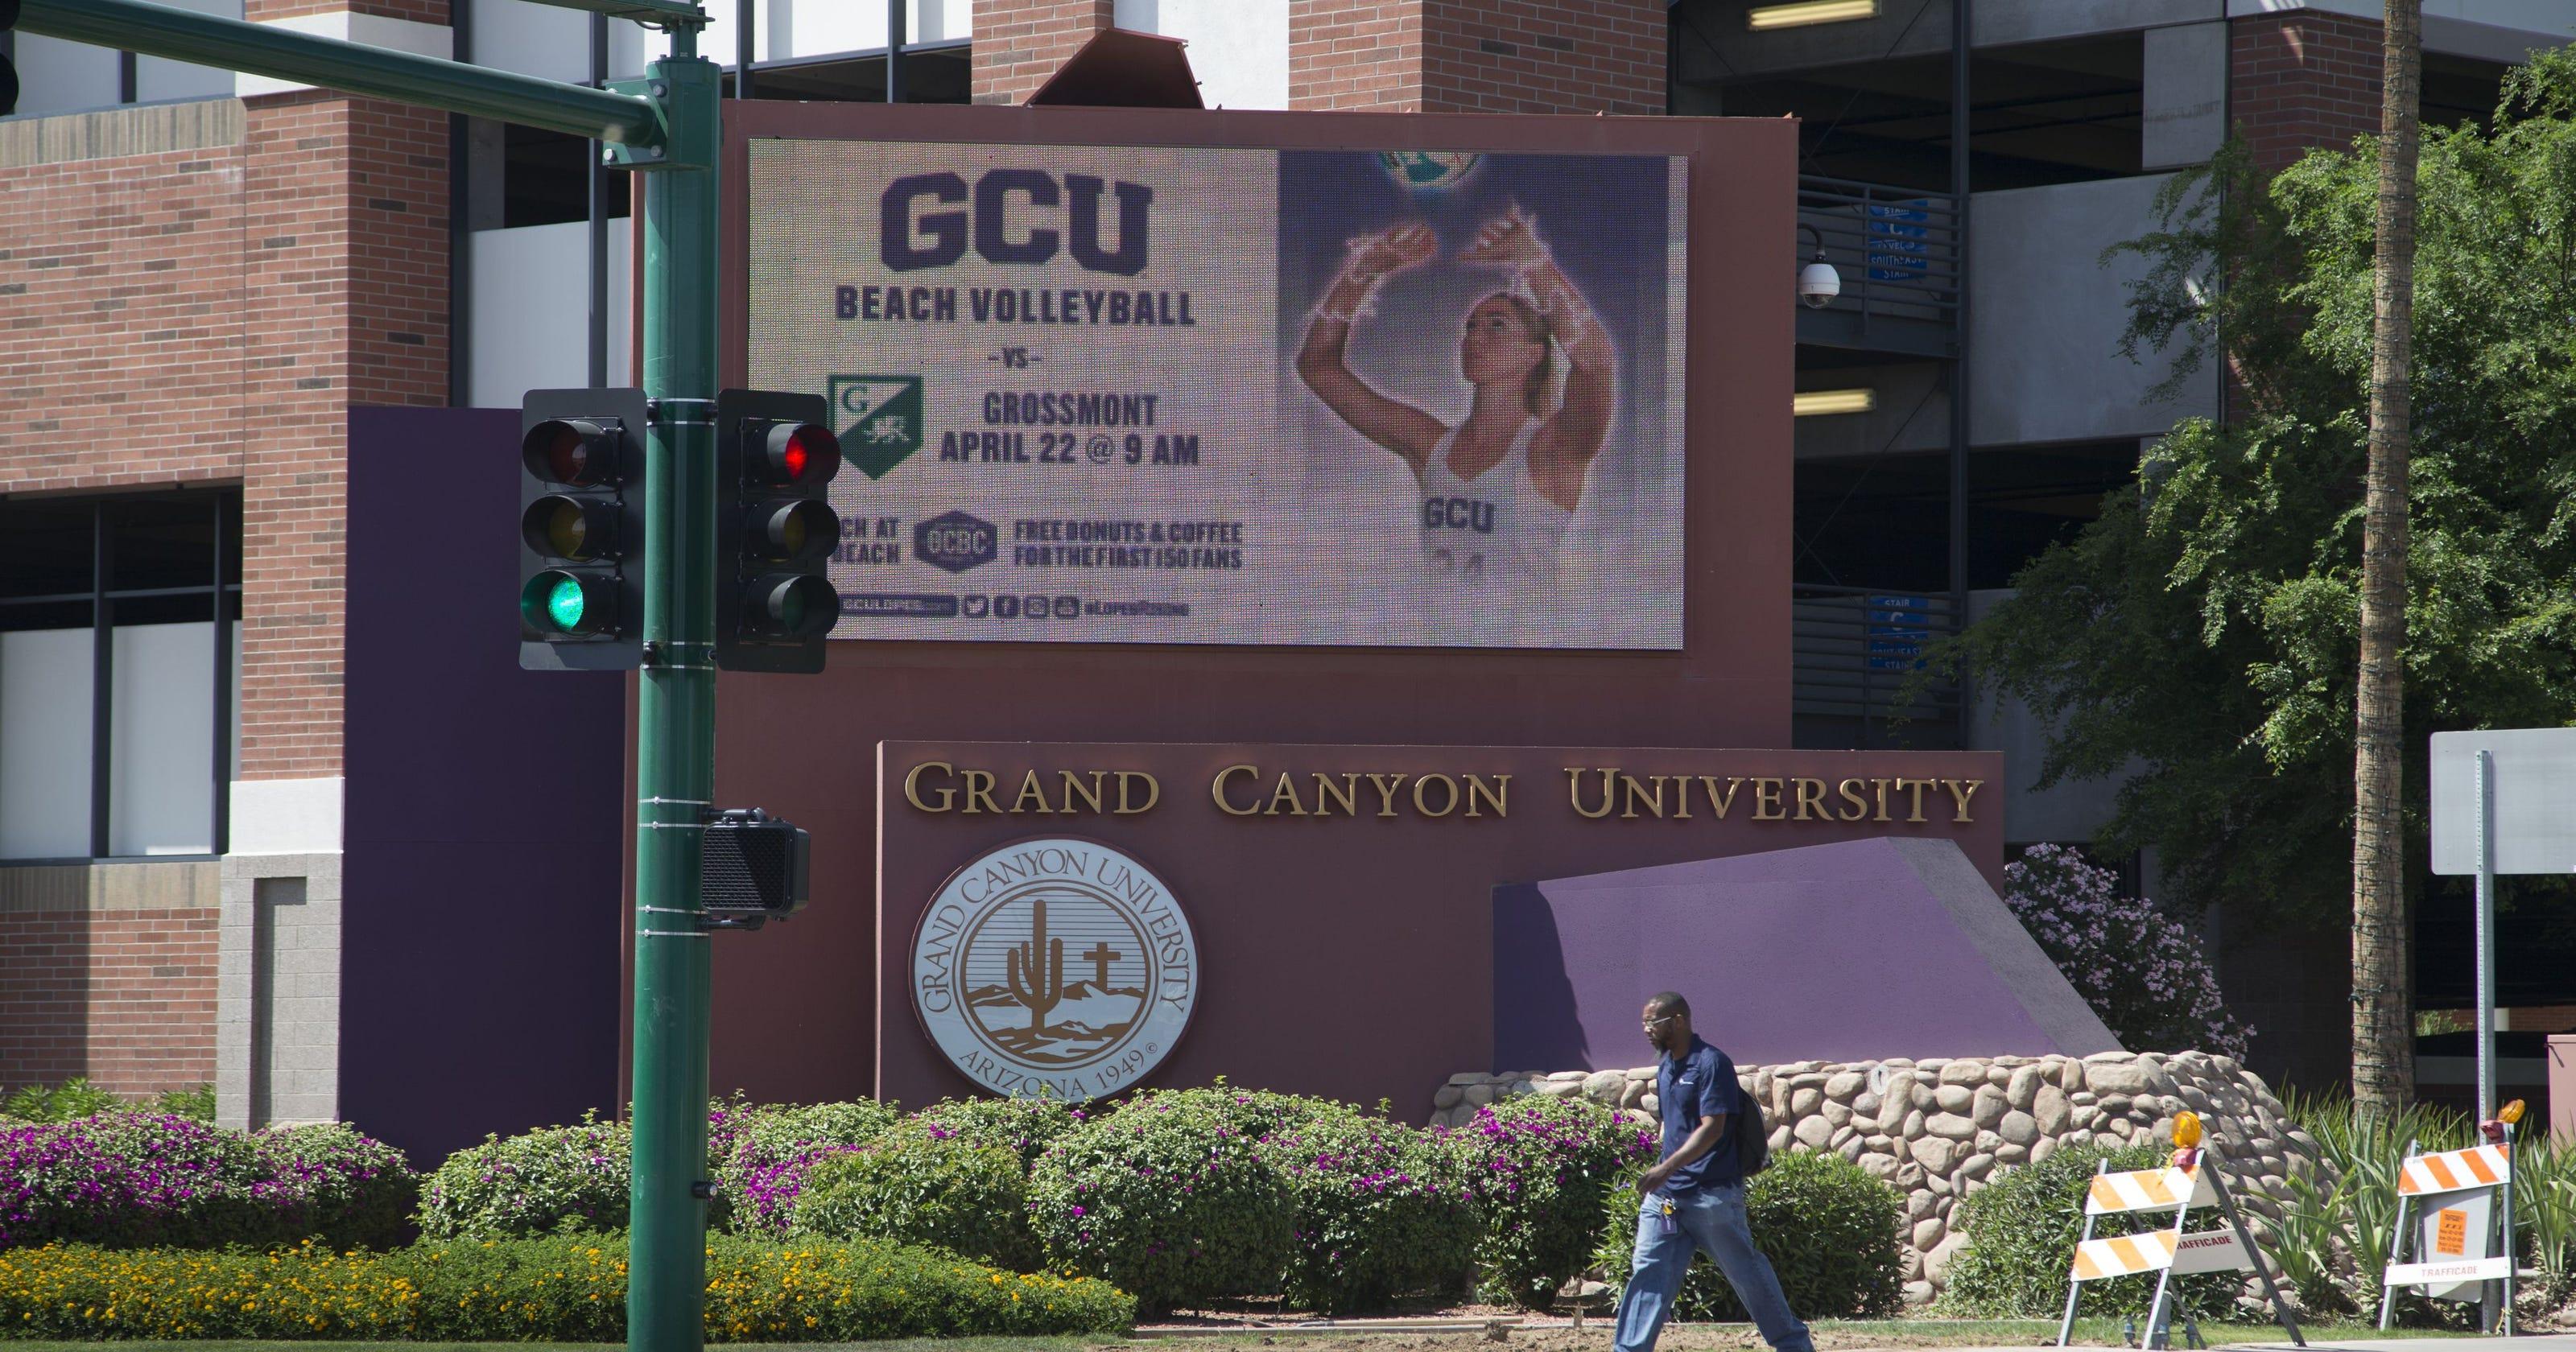 GCU skips U S  News college rankings, calling them 'irrelevant'